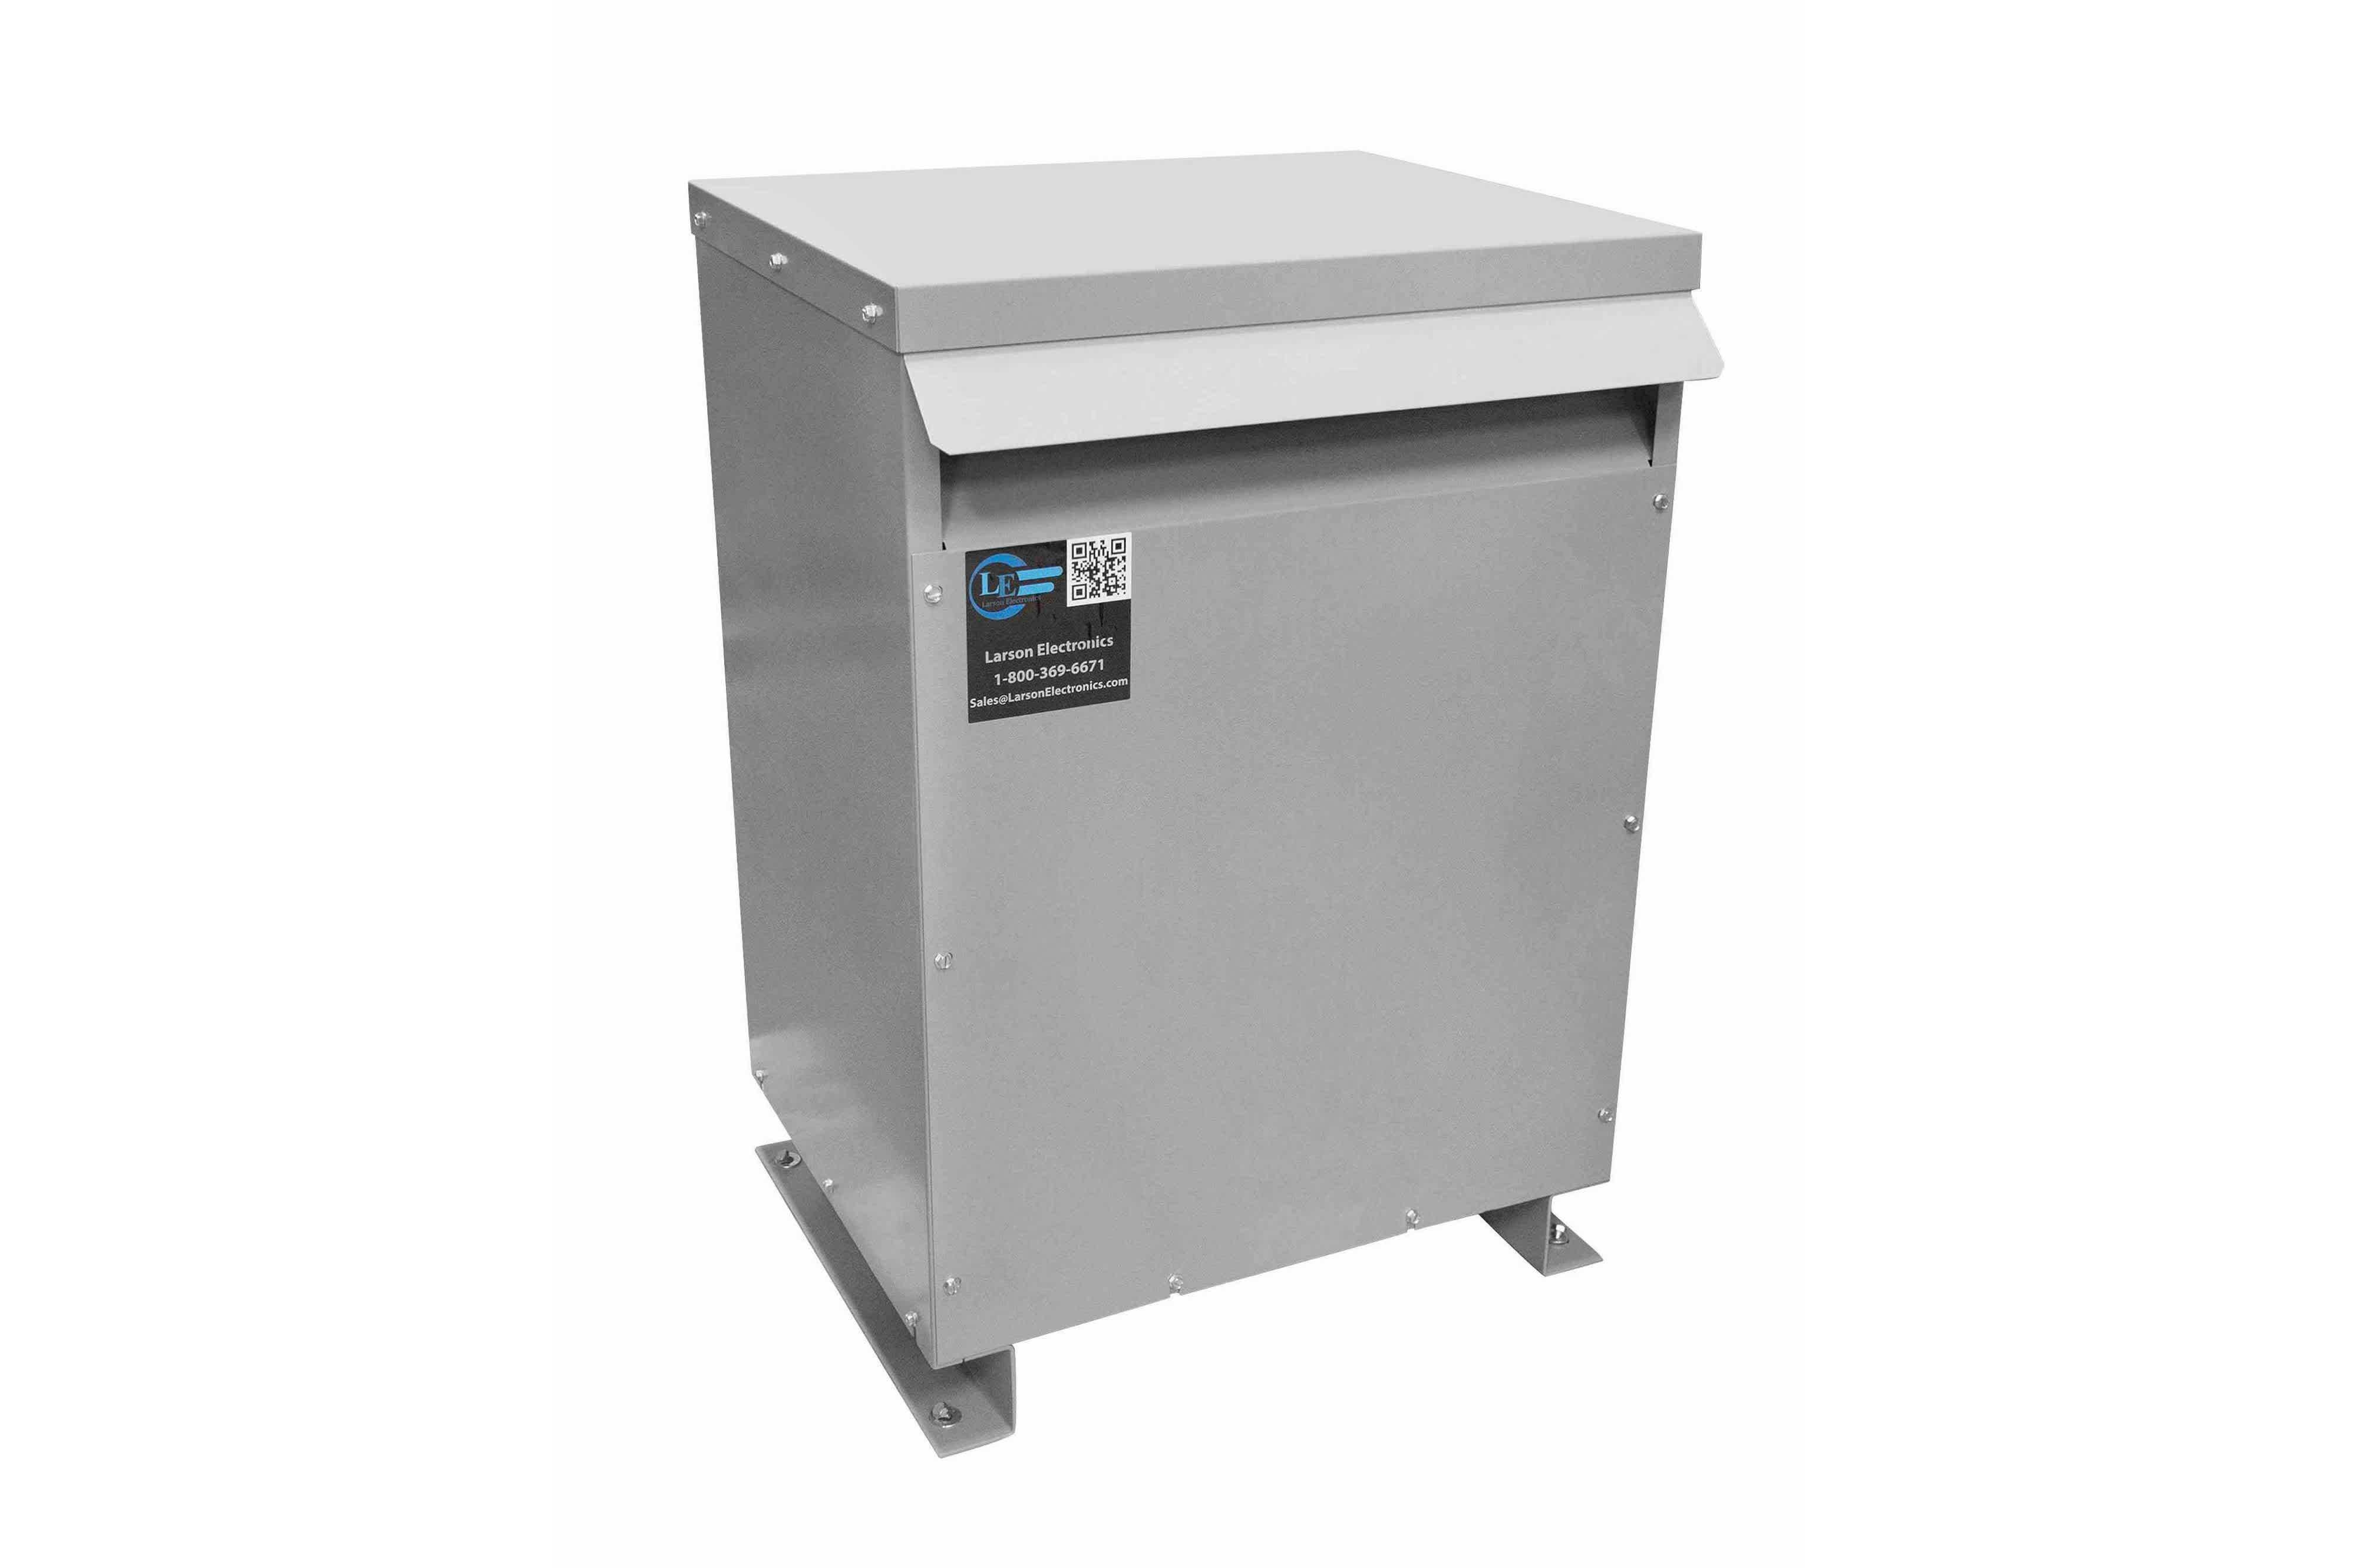 60 kVA 3PH Isolation Transformer, 400V Wye Primary, 240V/120 Delta Secondary, N3R, Ventilated, 60 Hz